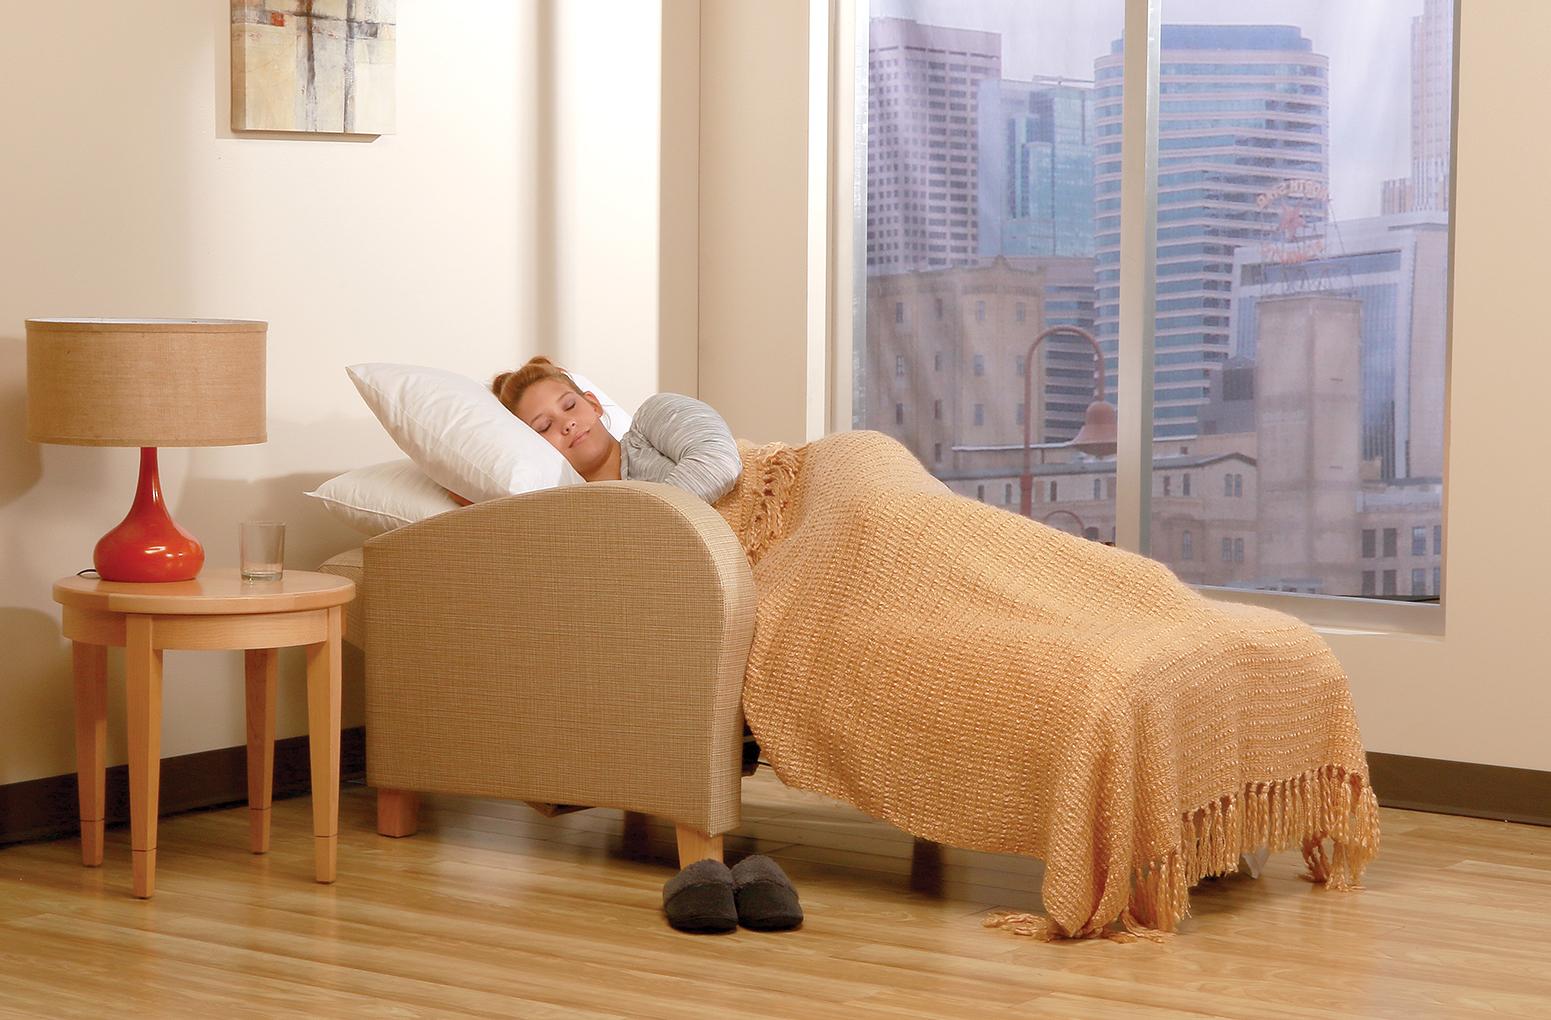 arris sleep chair  Wieland Healthcare Furniture